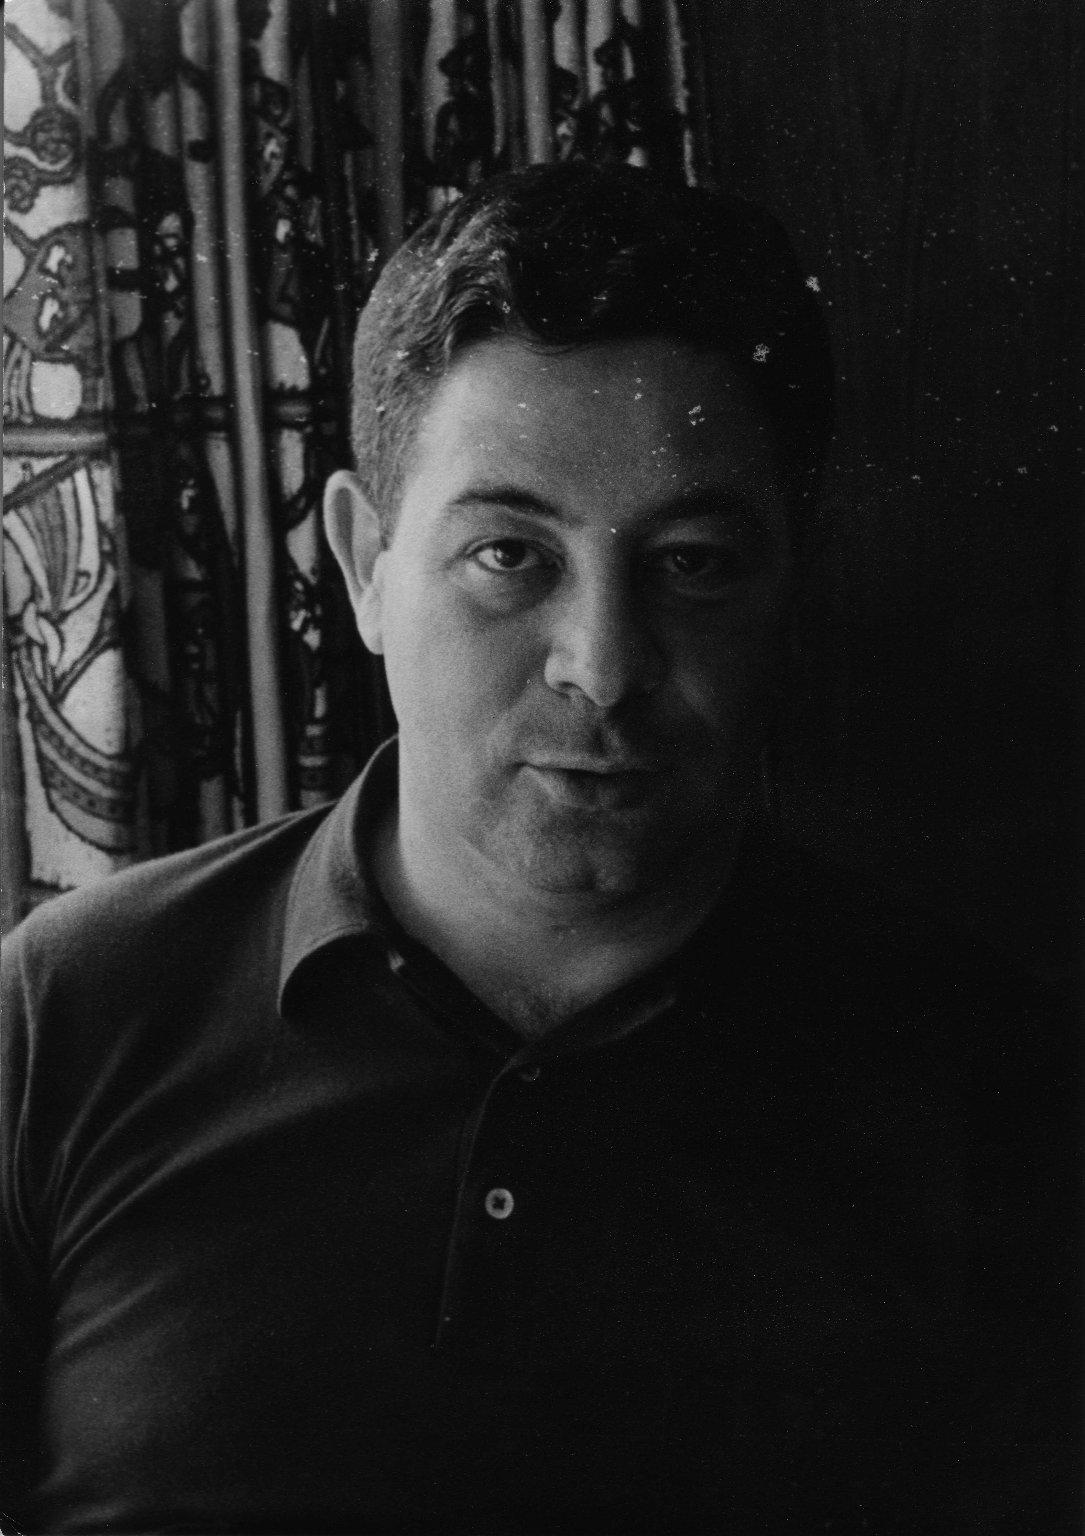 Candid photo of Rabbi Richard L. Rubenstein in Winnipeg, Canada, ca. 1966.